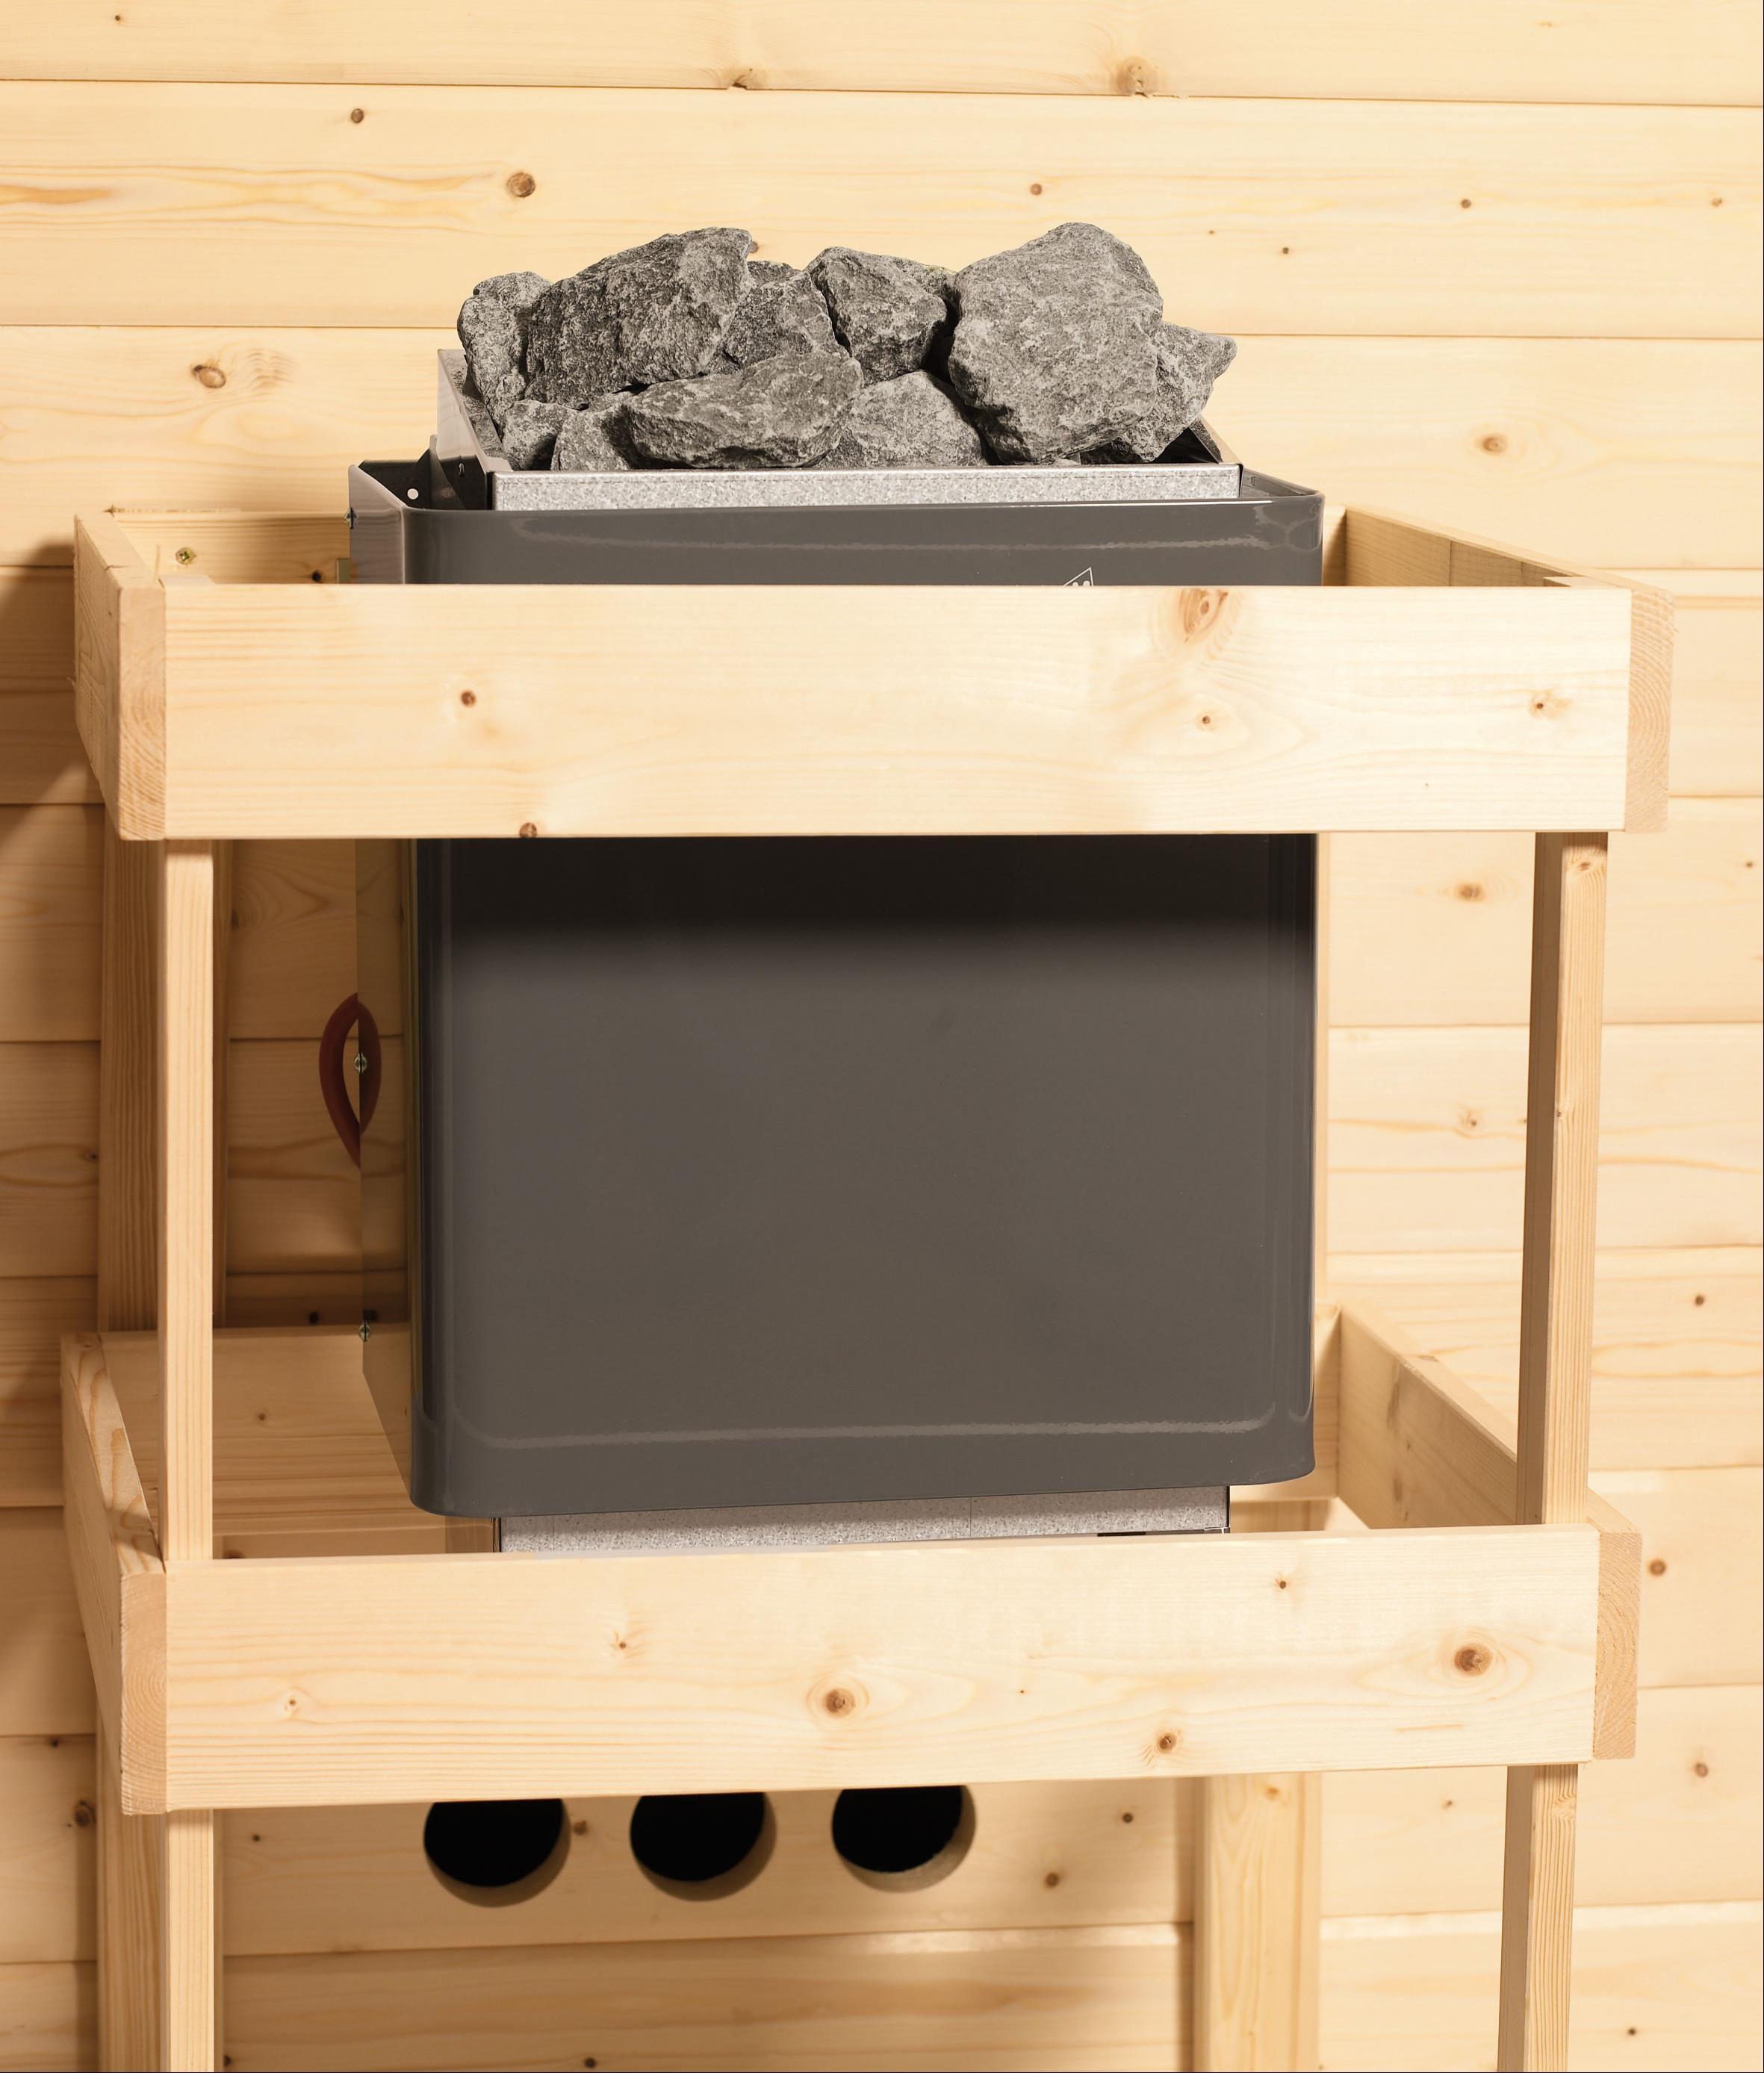 Woodfeeling Sauna Svenja 38mm mit Saunaofen 9 kW moderne Tür Bild 9